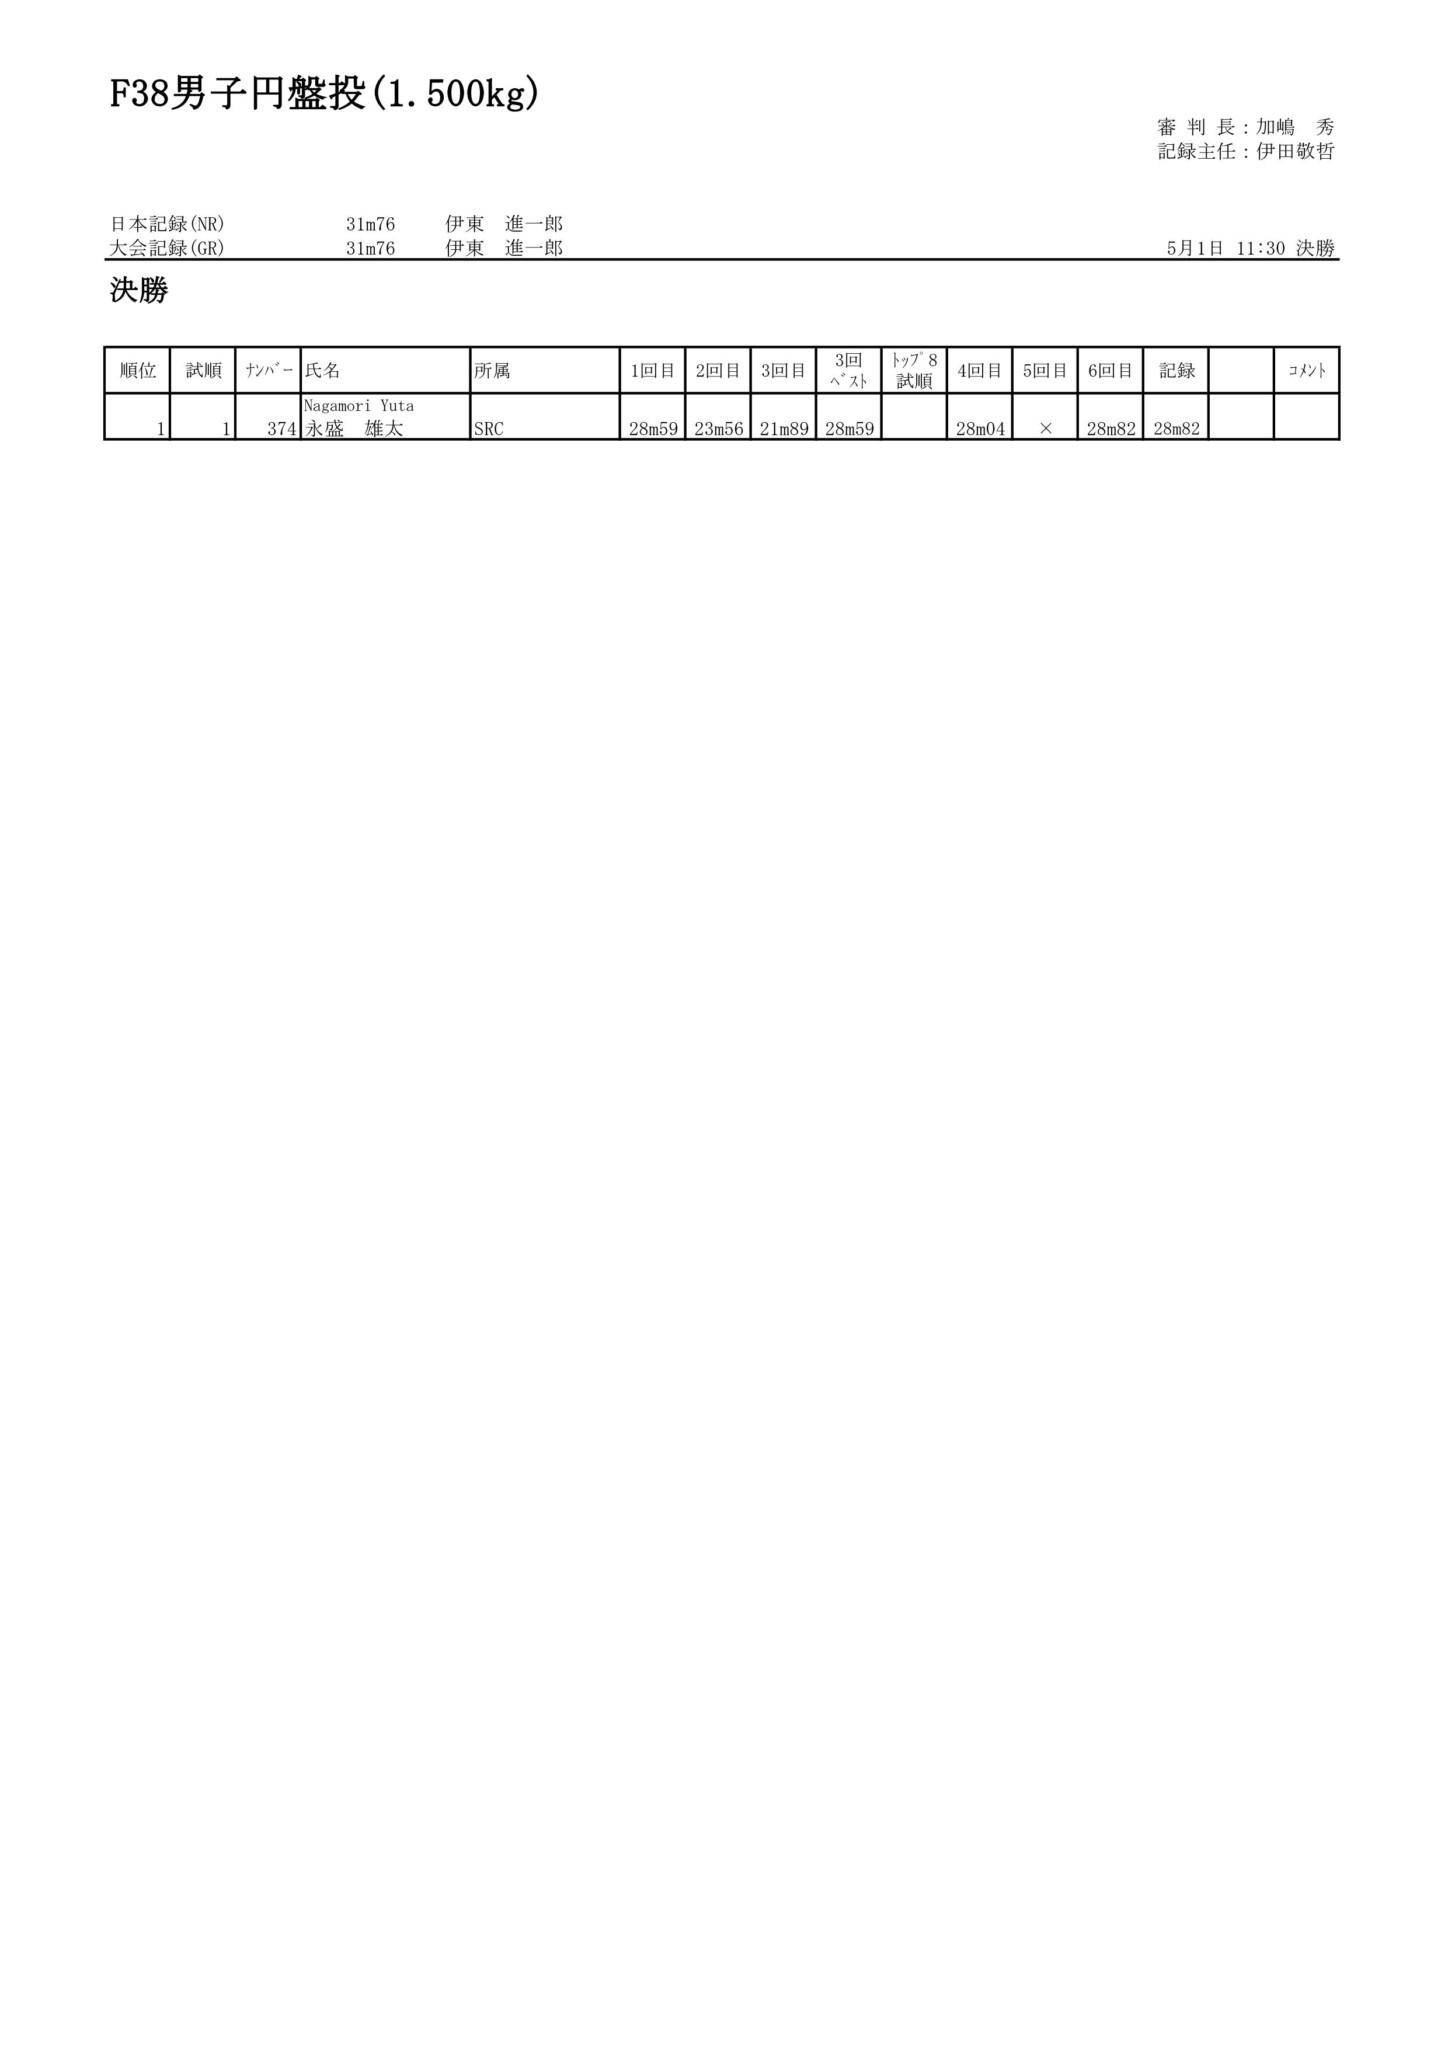 39F38男子円盤投(1.500kg)_01